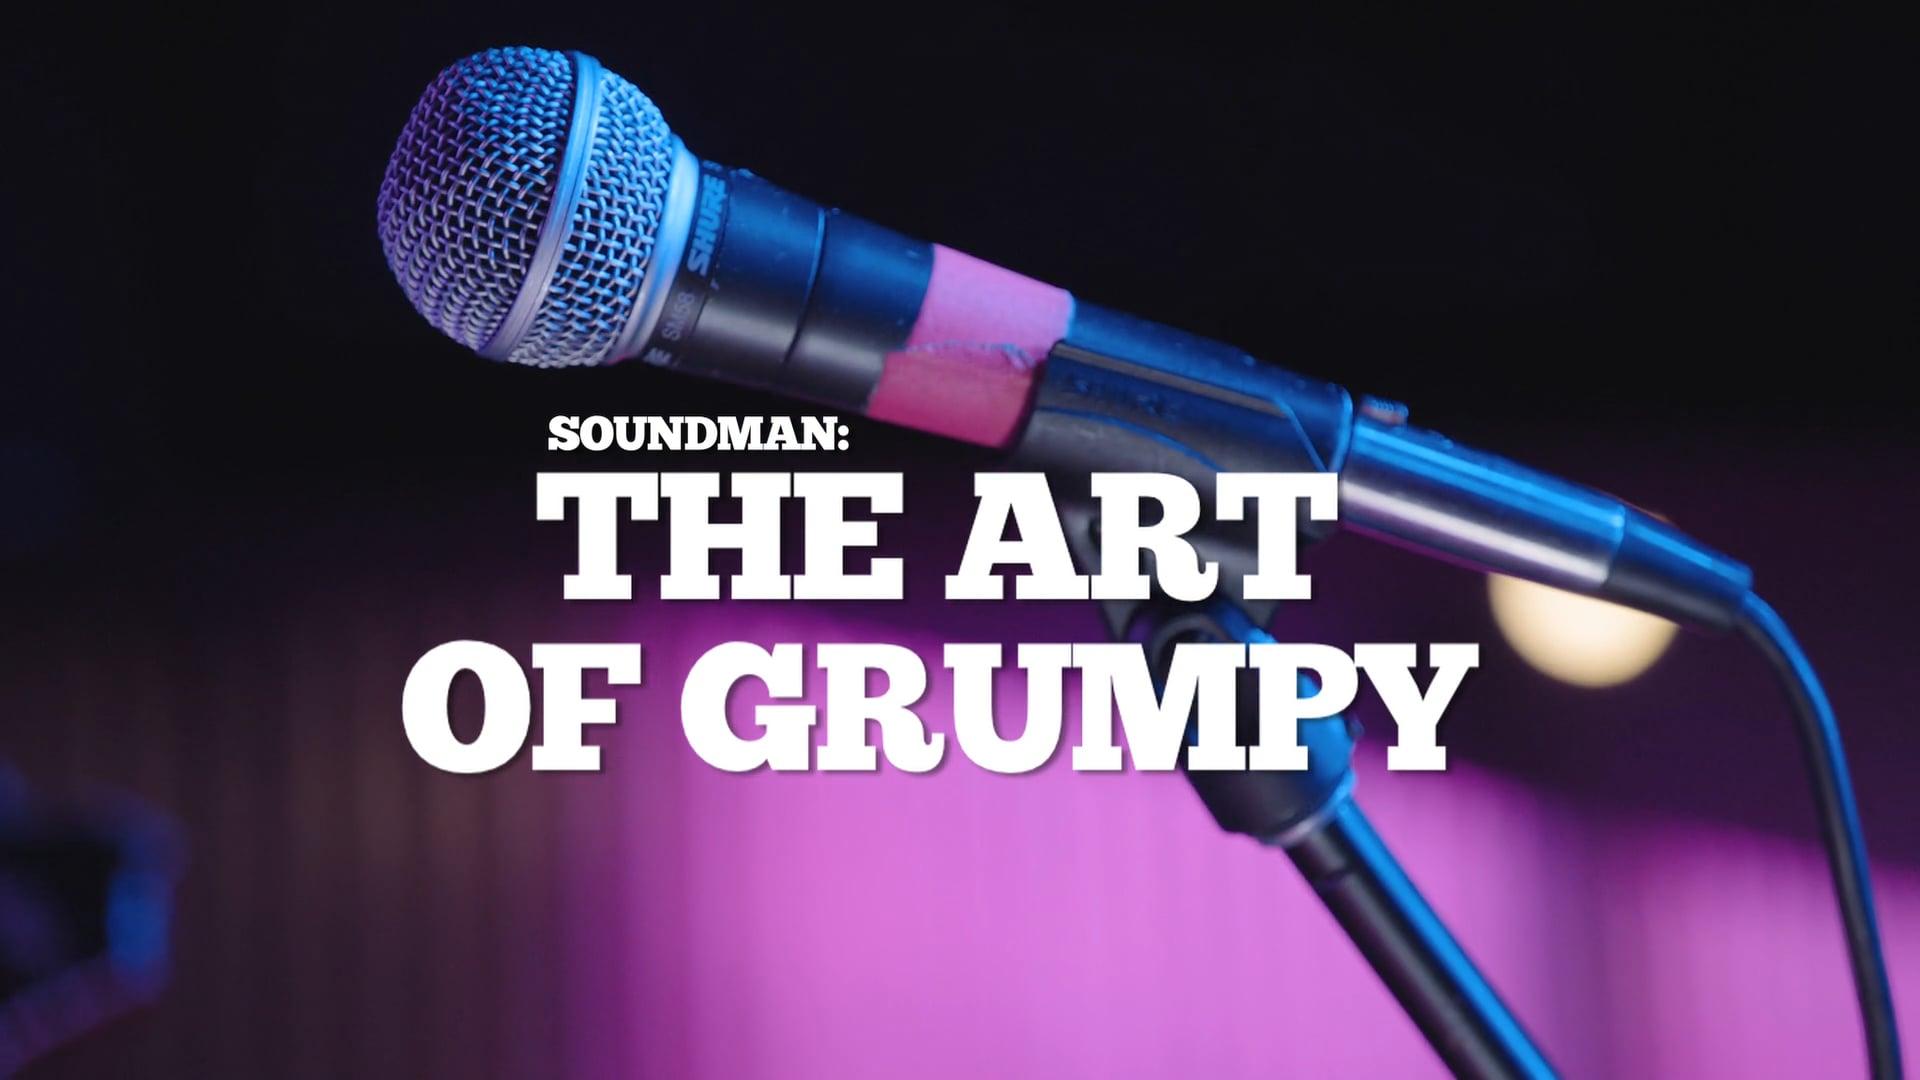 SOUNDMAN- THE ART OF GRUMPY